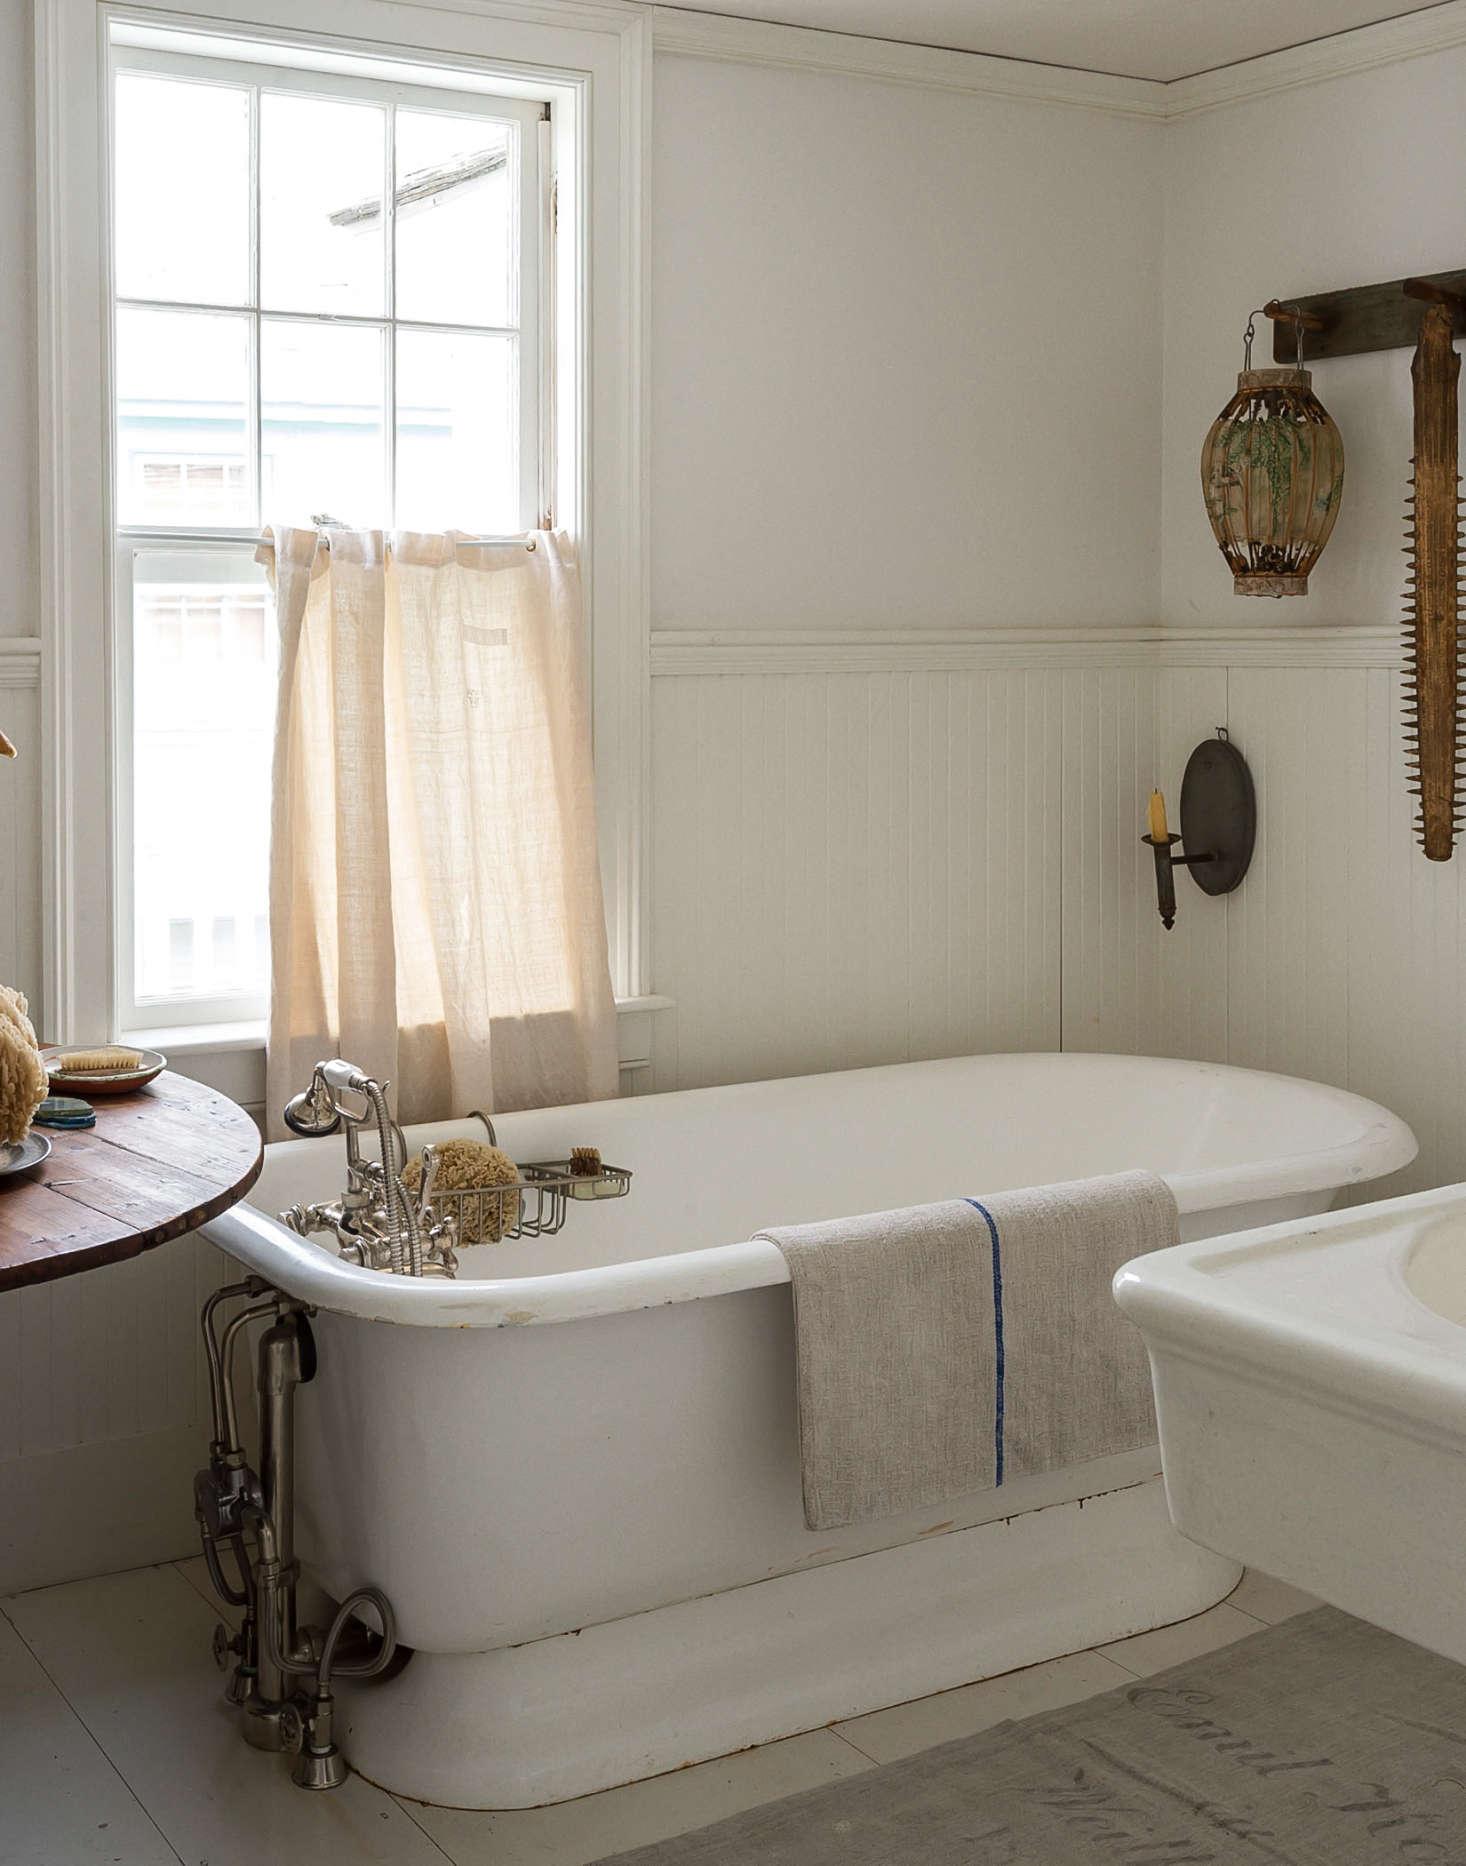 Remodeling 101 Romance In The Bath Built In Vs Freestanding Bathtubs Remodelista